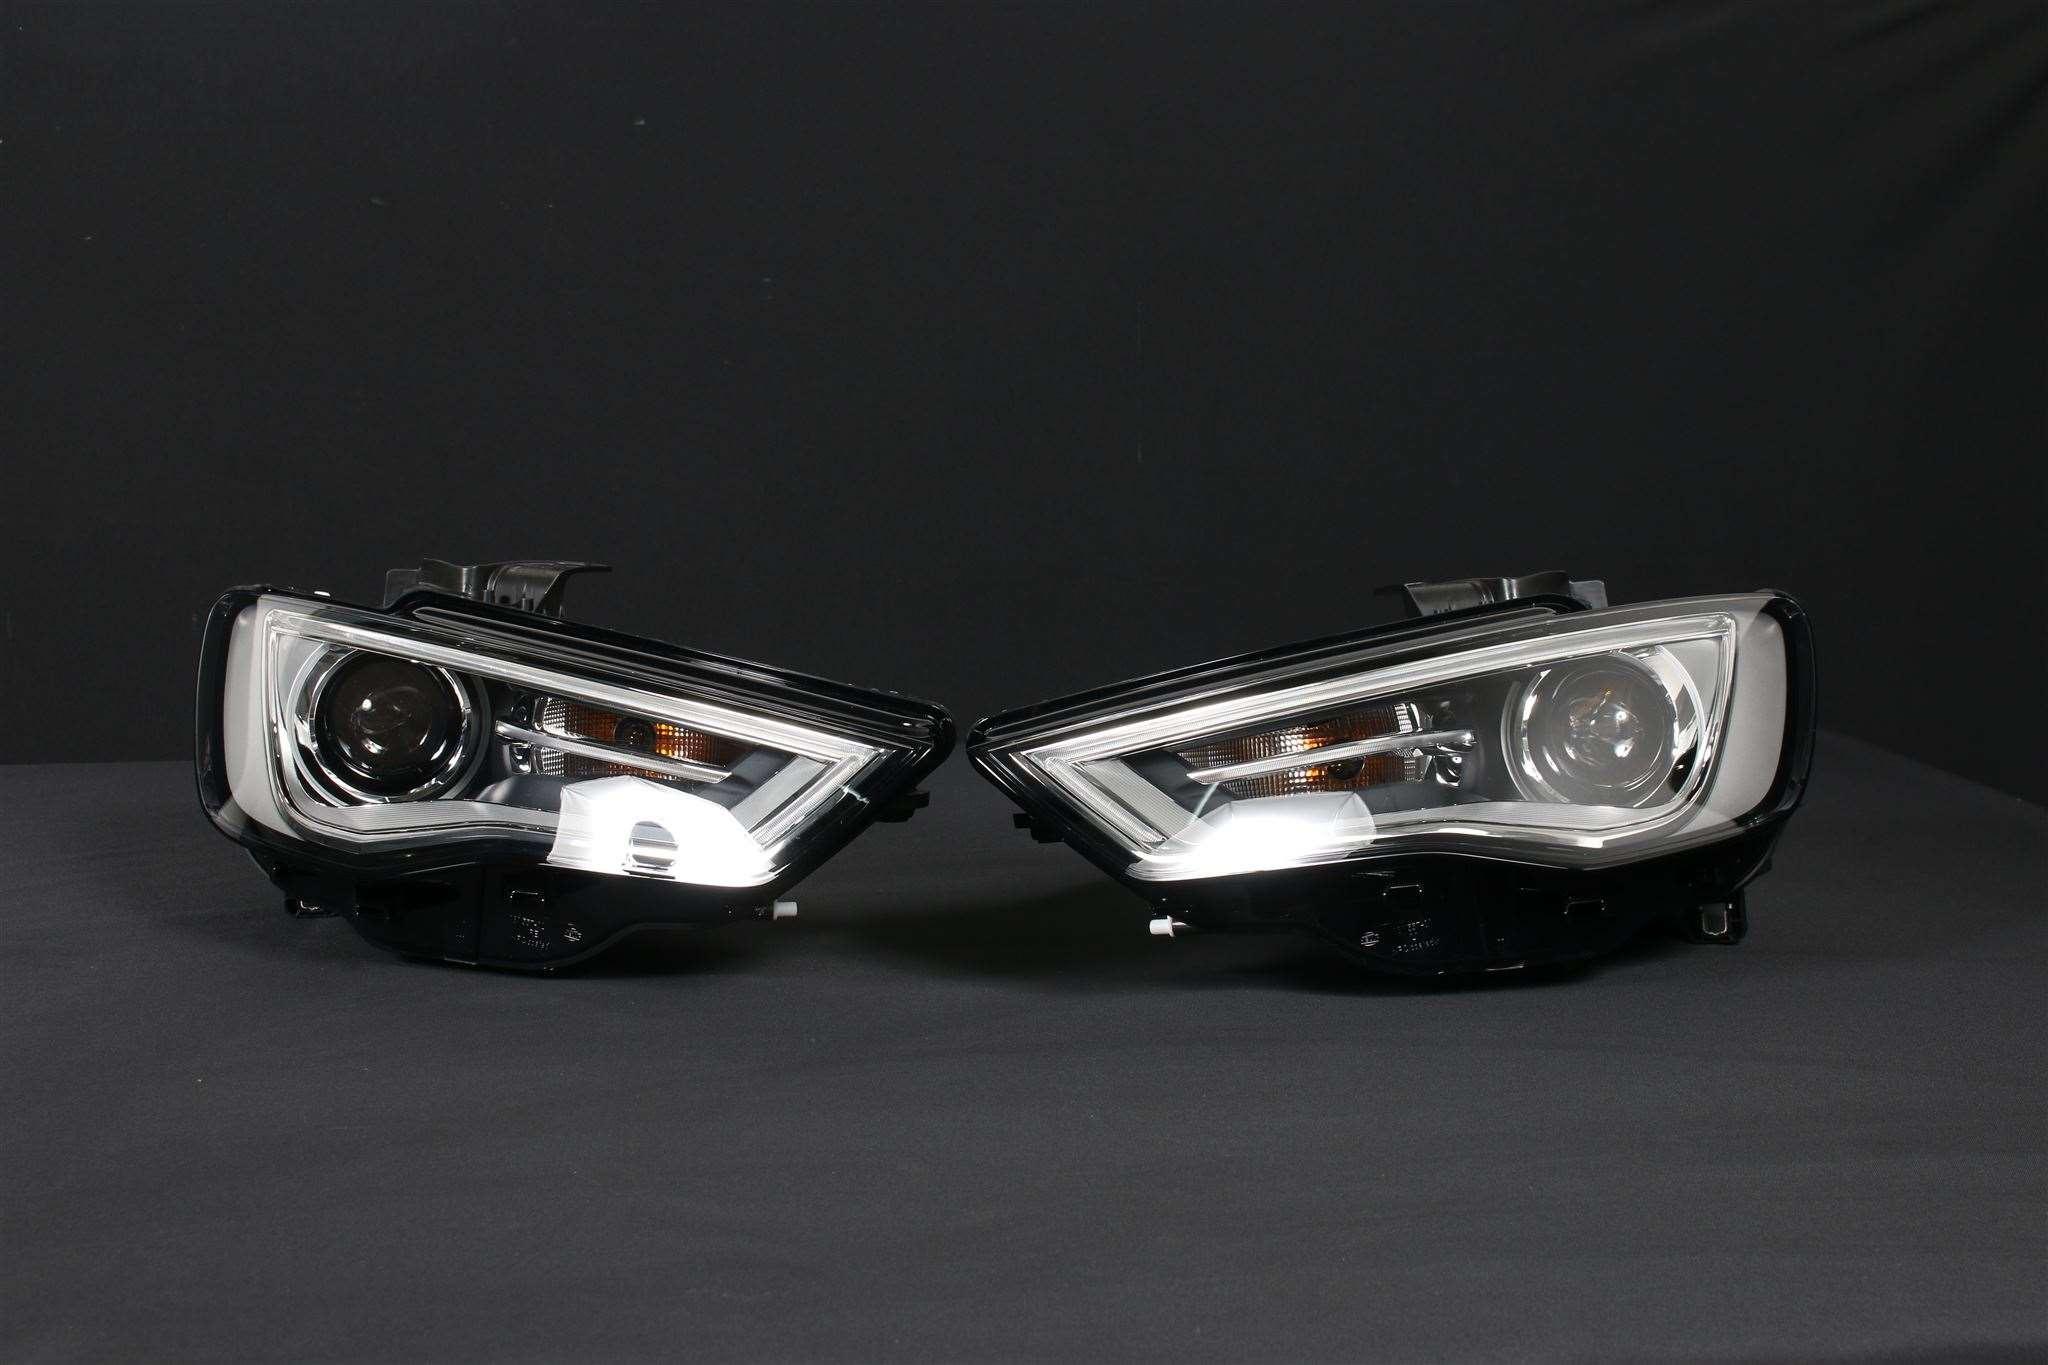 audi a3 8v sportback bi xenon 2x headlight l r lights front head lights ebay. Black Bedroom Furniture Sets. Home Design Ideas